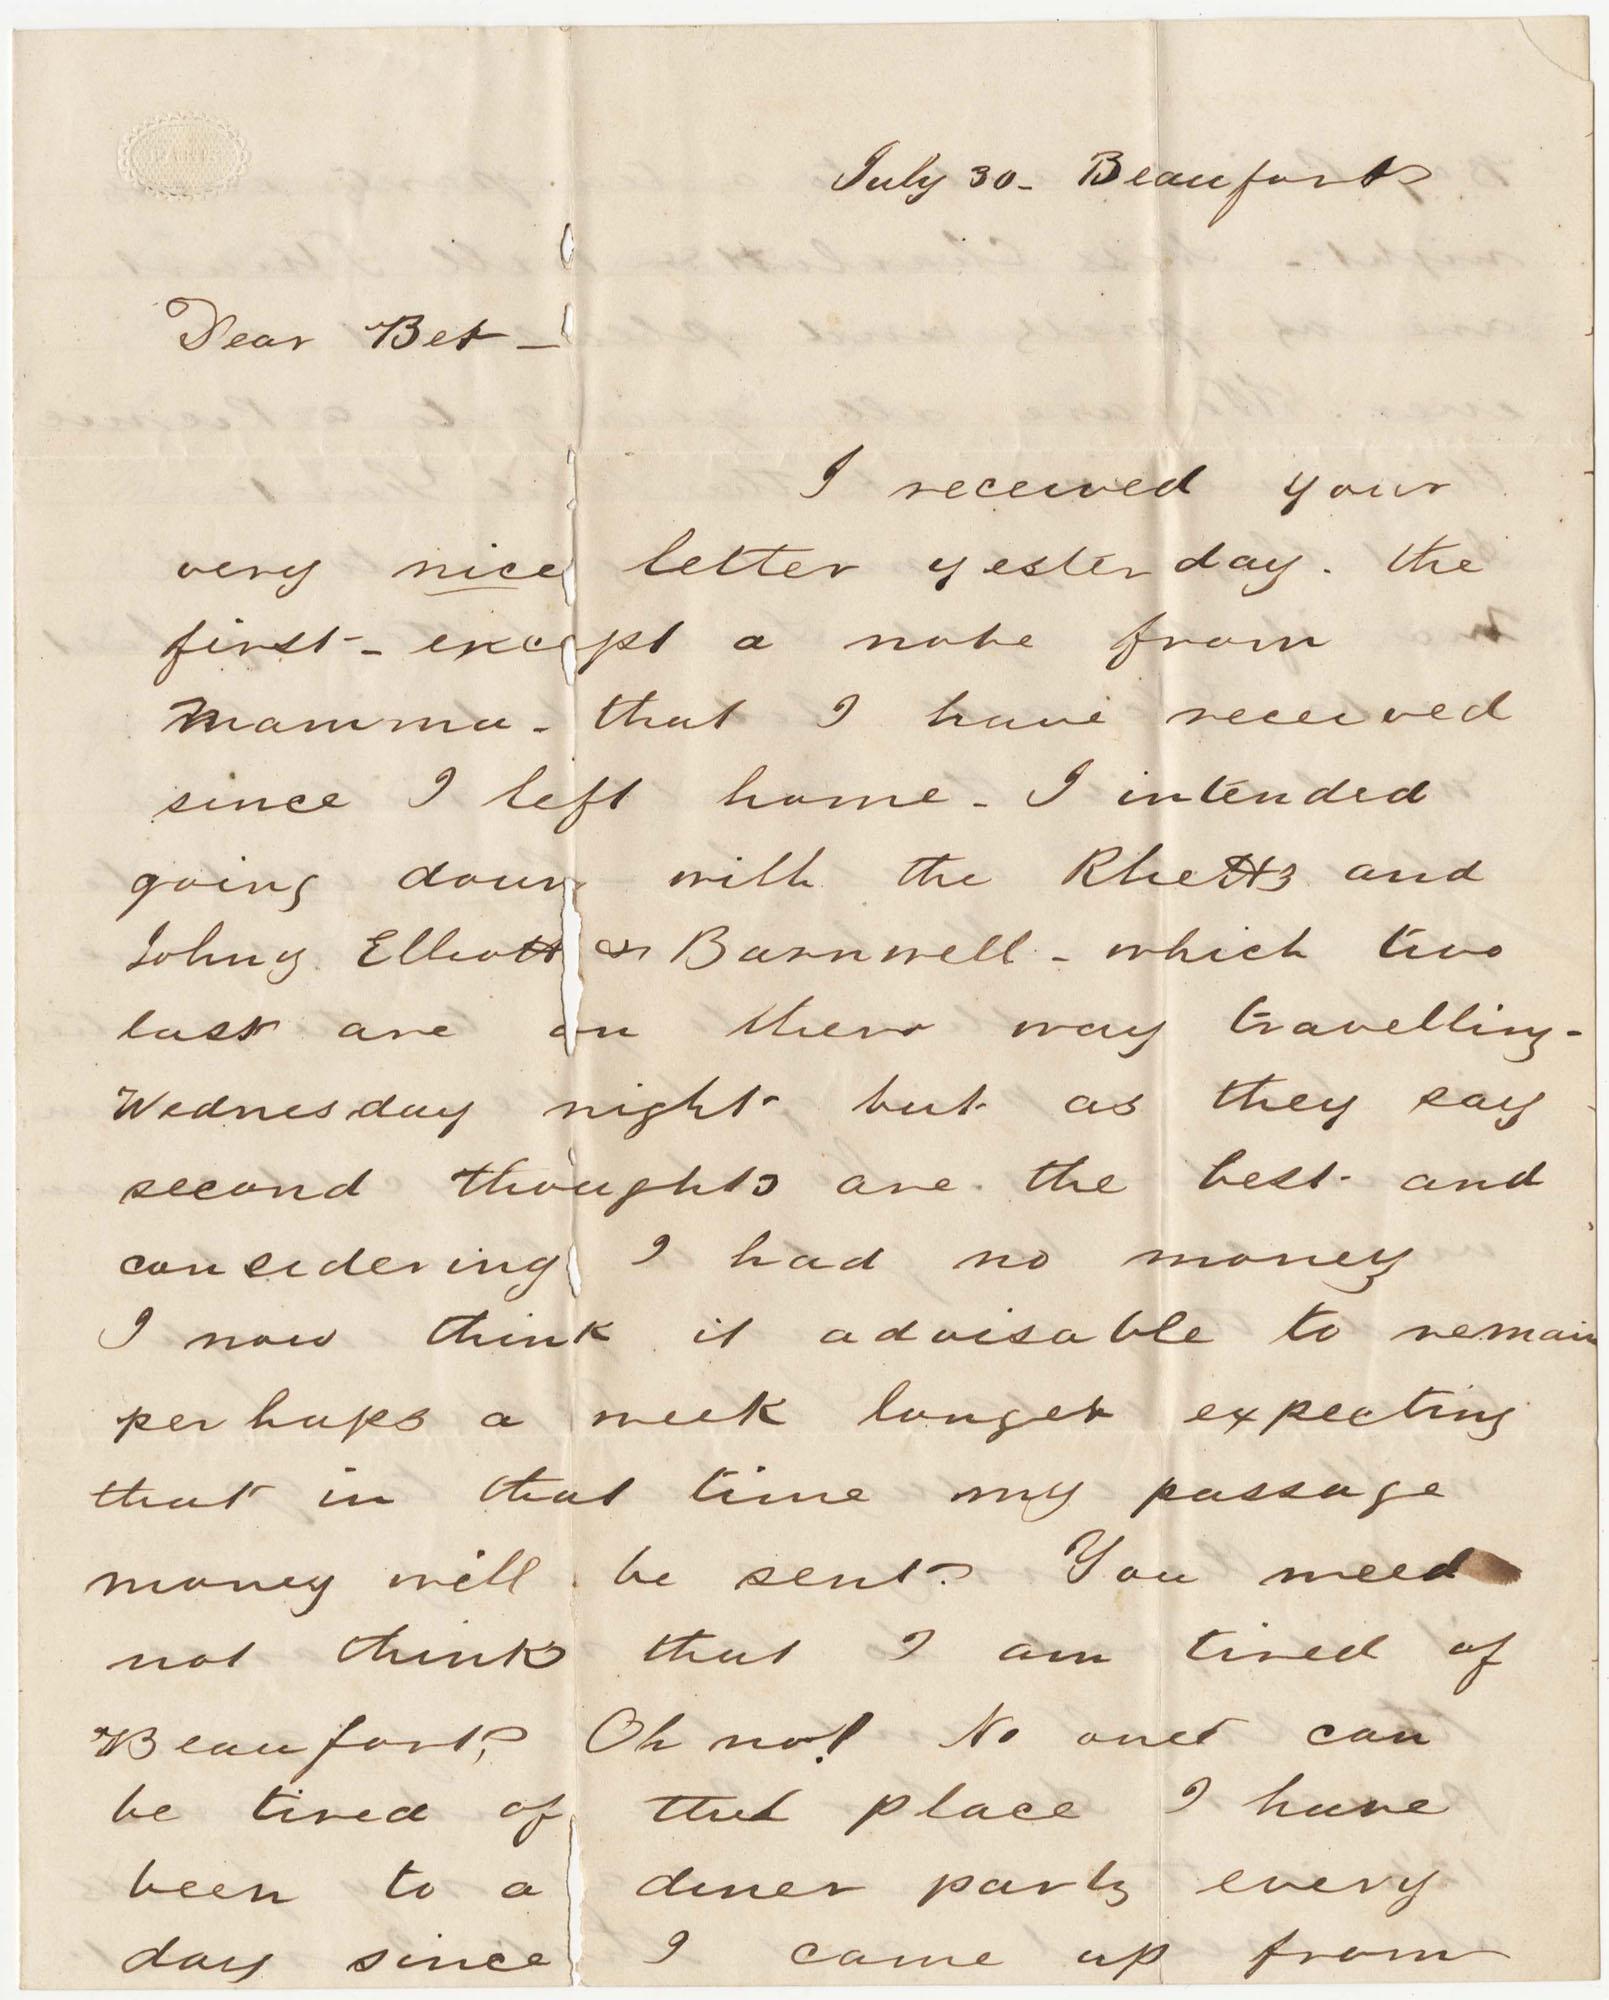 475.  Edward Barnwell to Elizabeth Barnwell -- n.d.